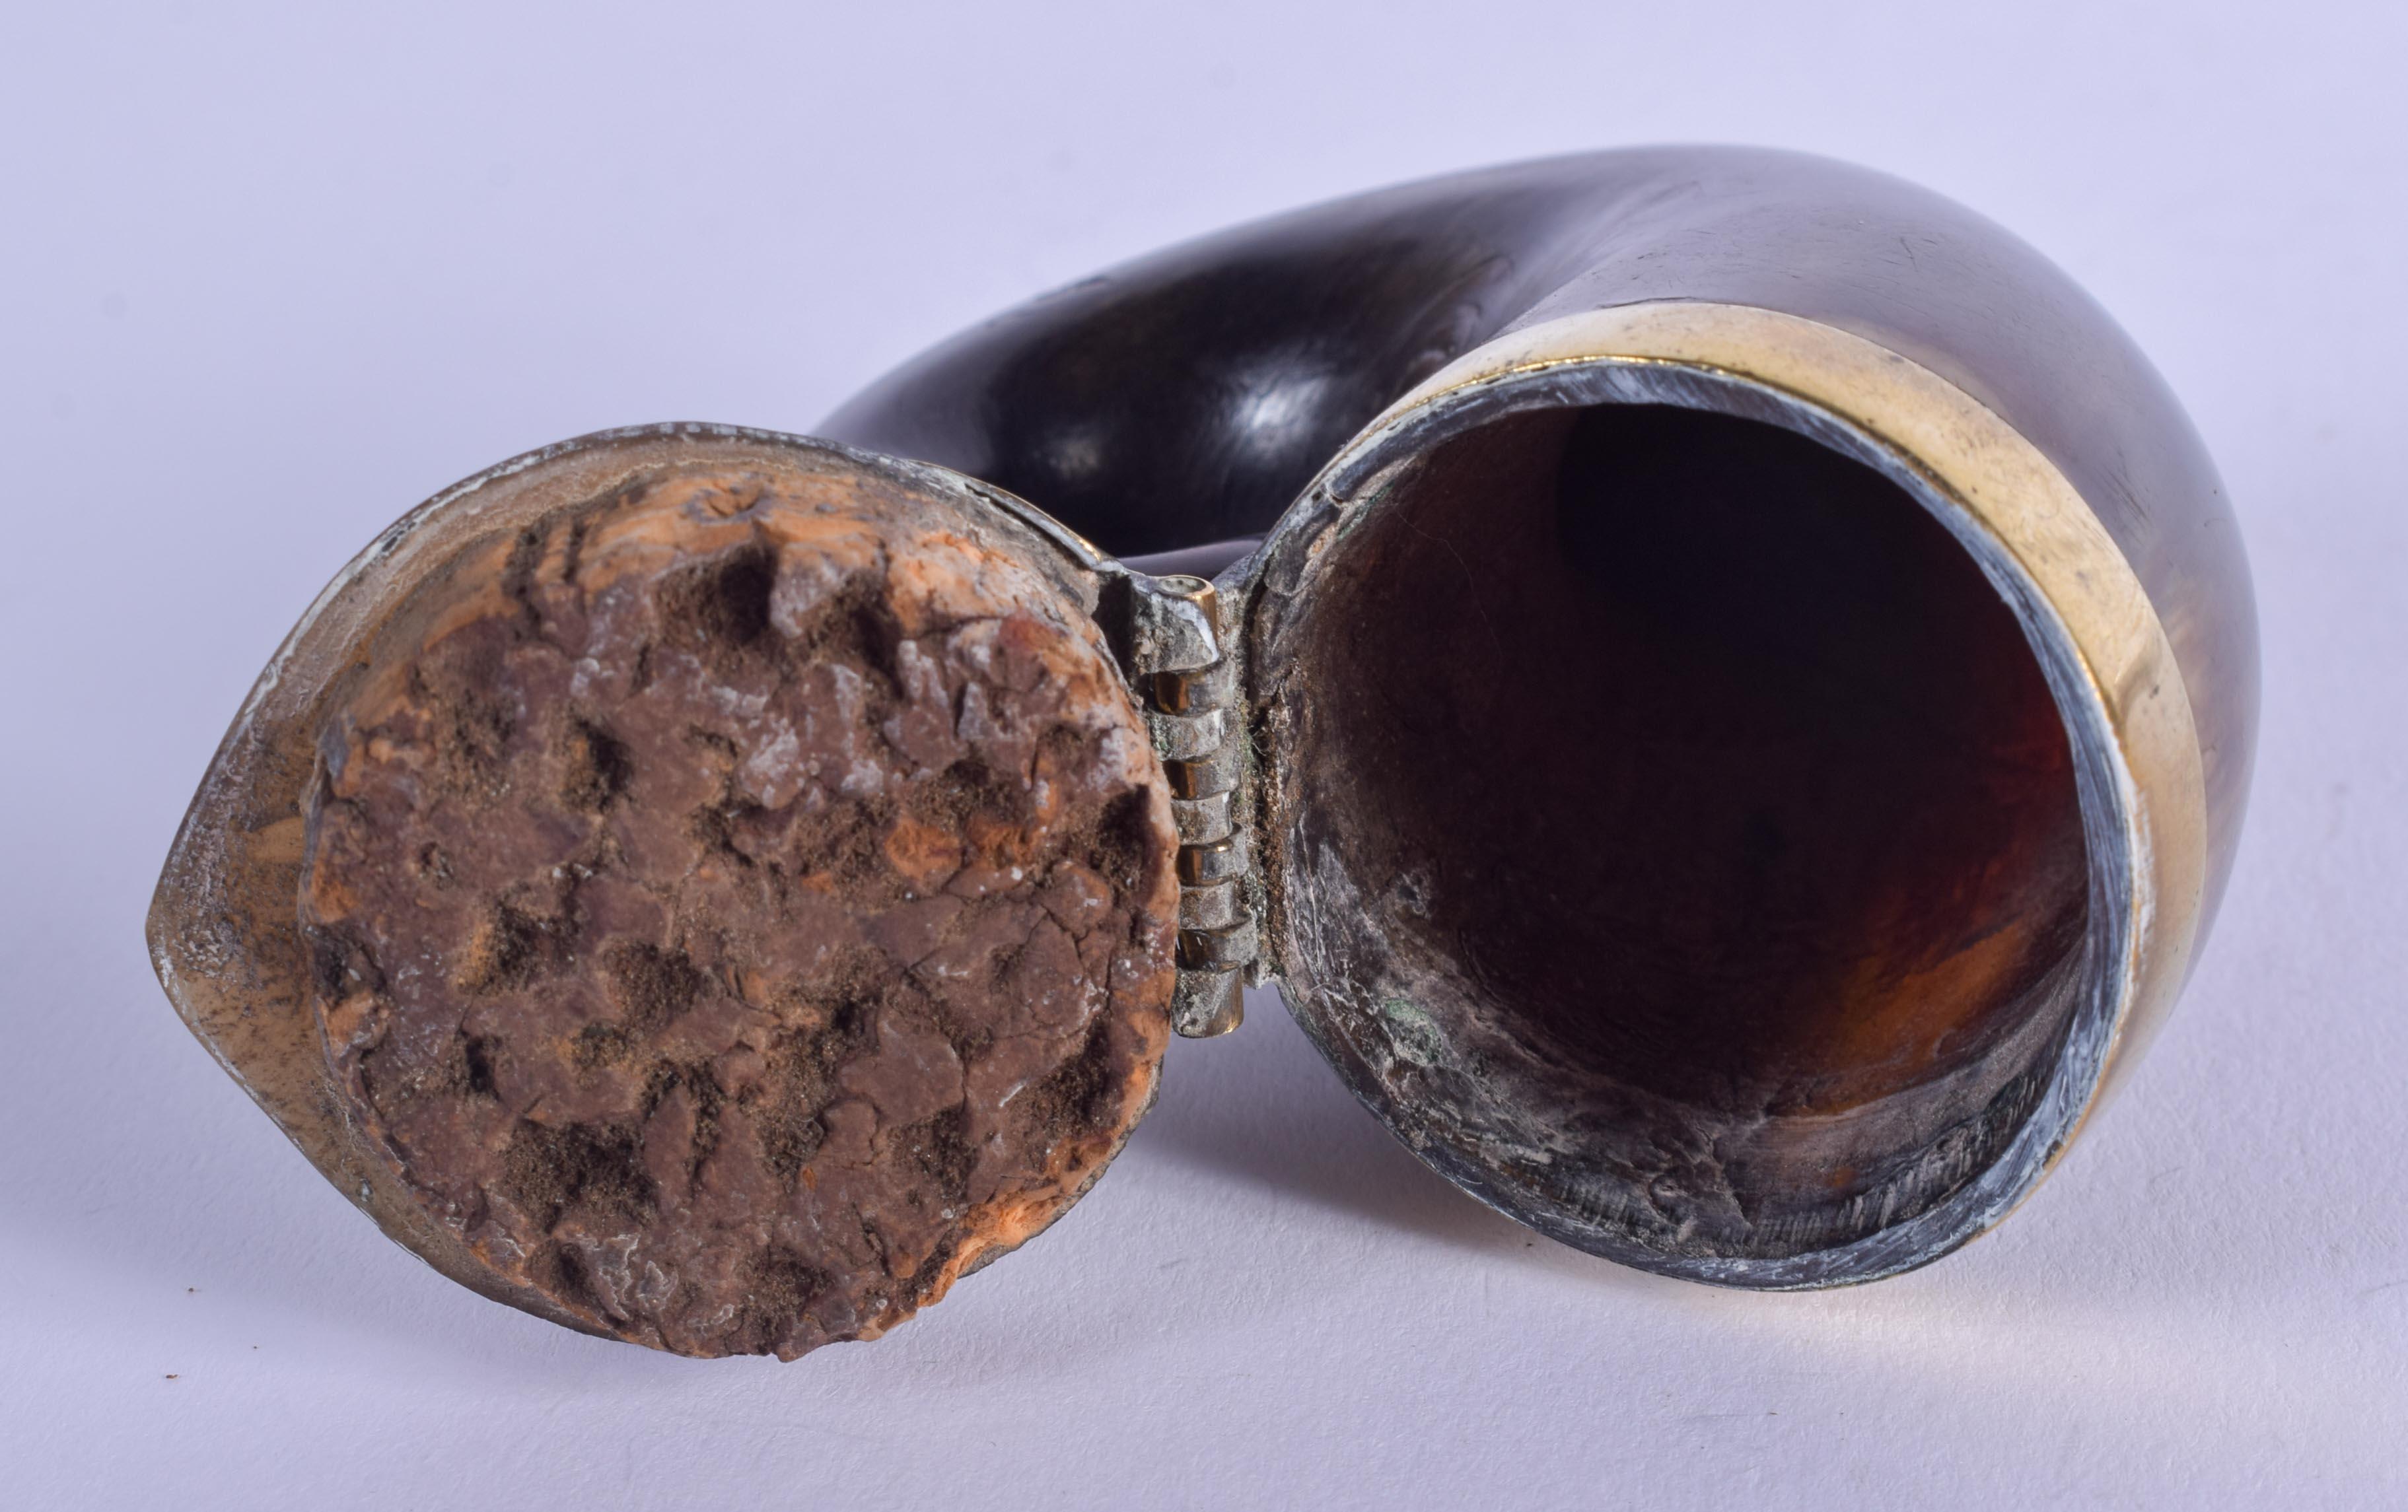 AN ANTIQUE SCOTTISH HORN SNUFF MULL. 6 cm x 6.5 cm. - Image 3 of 3